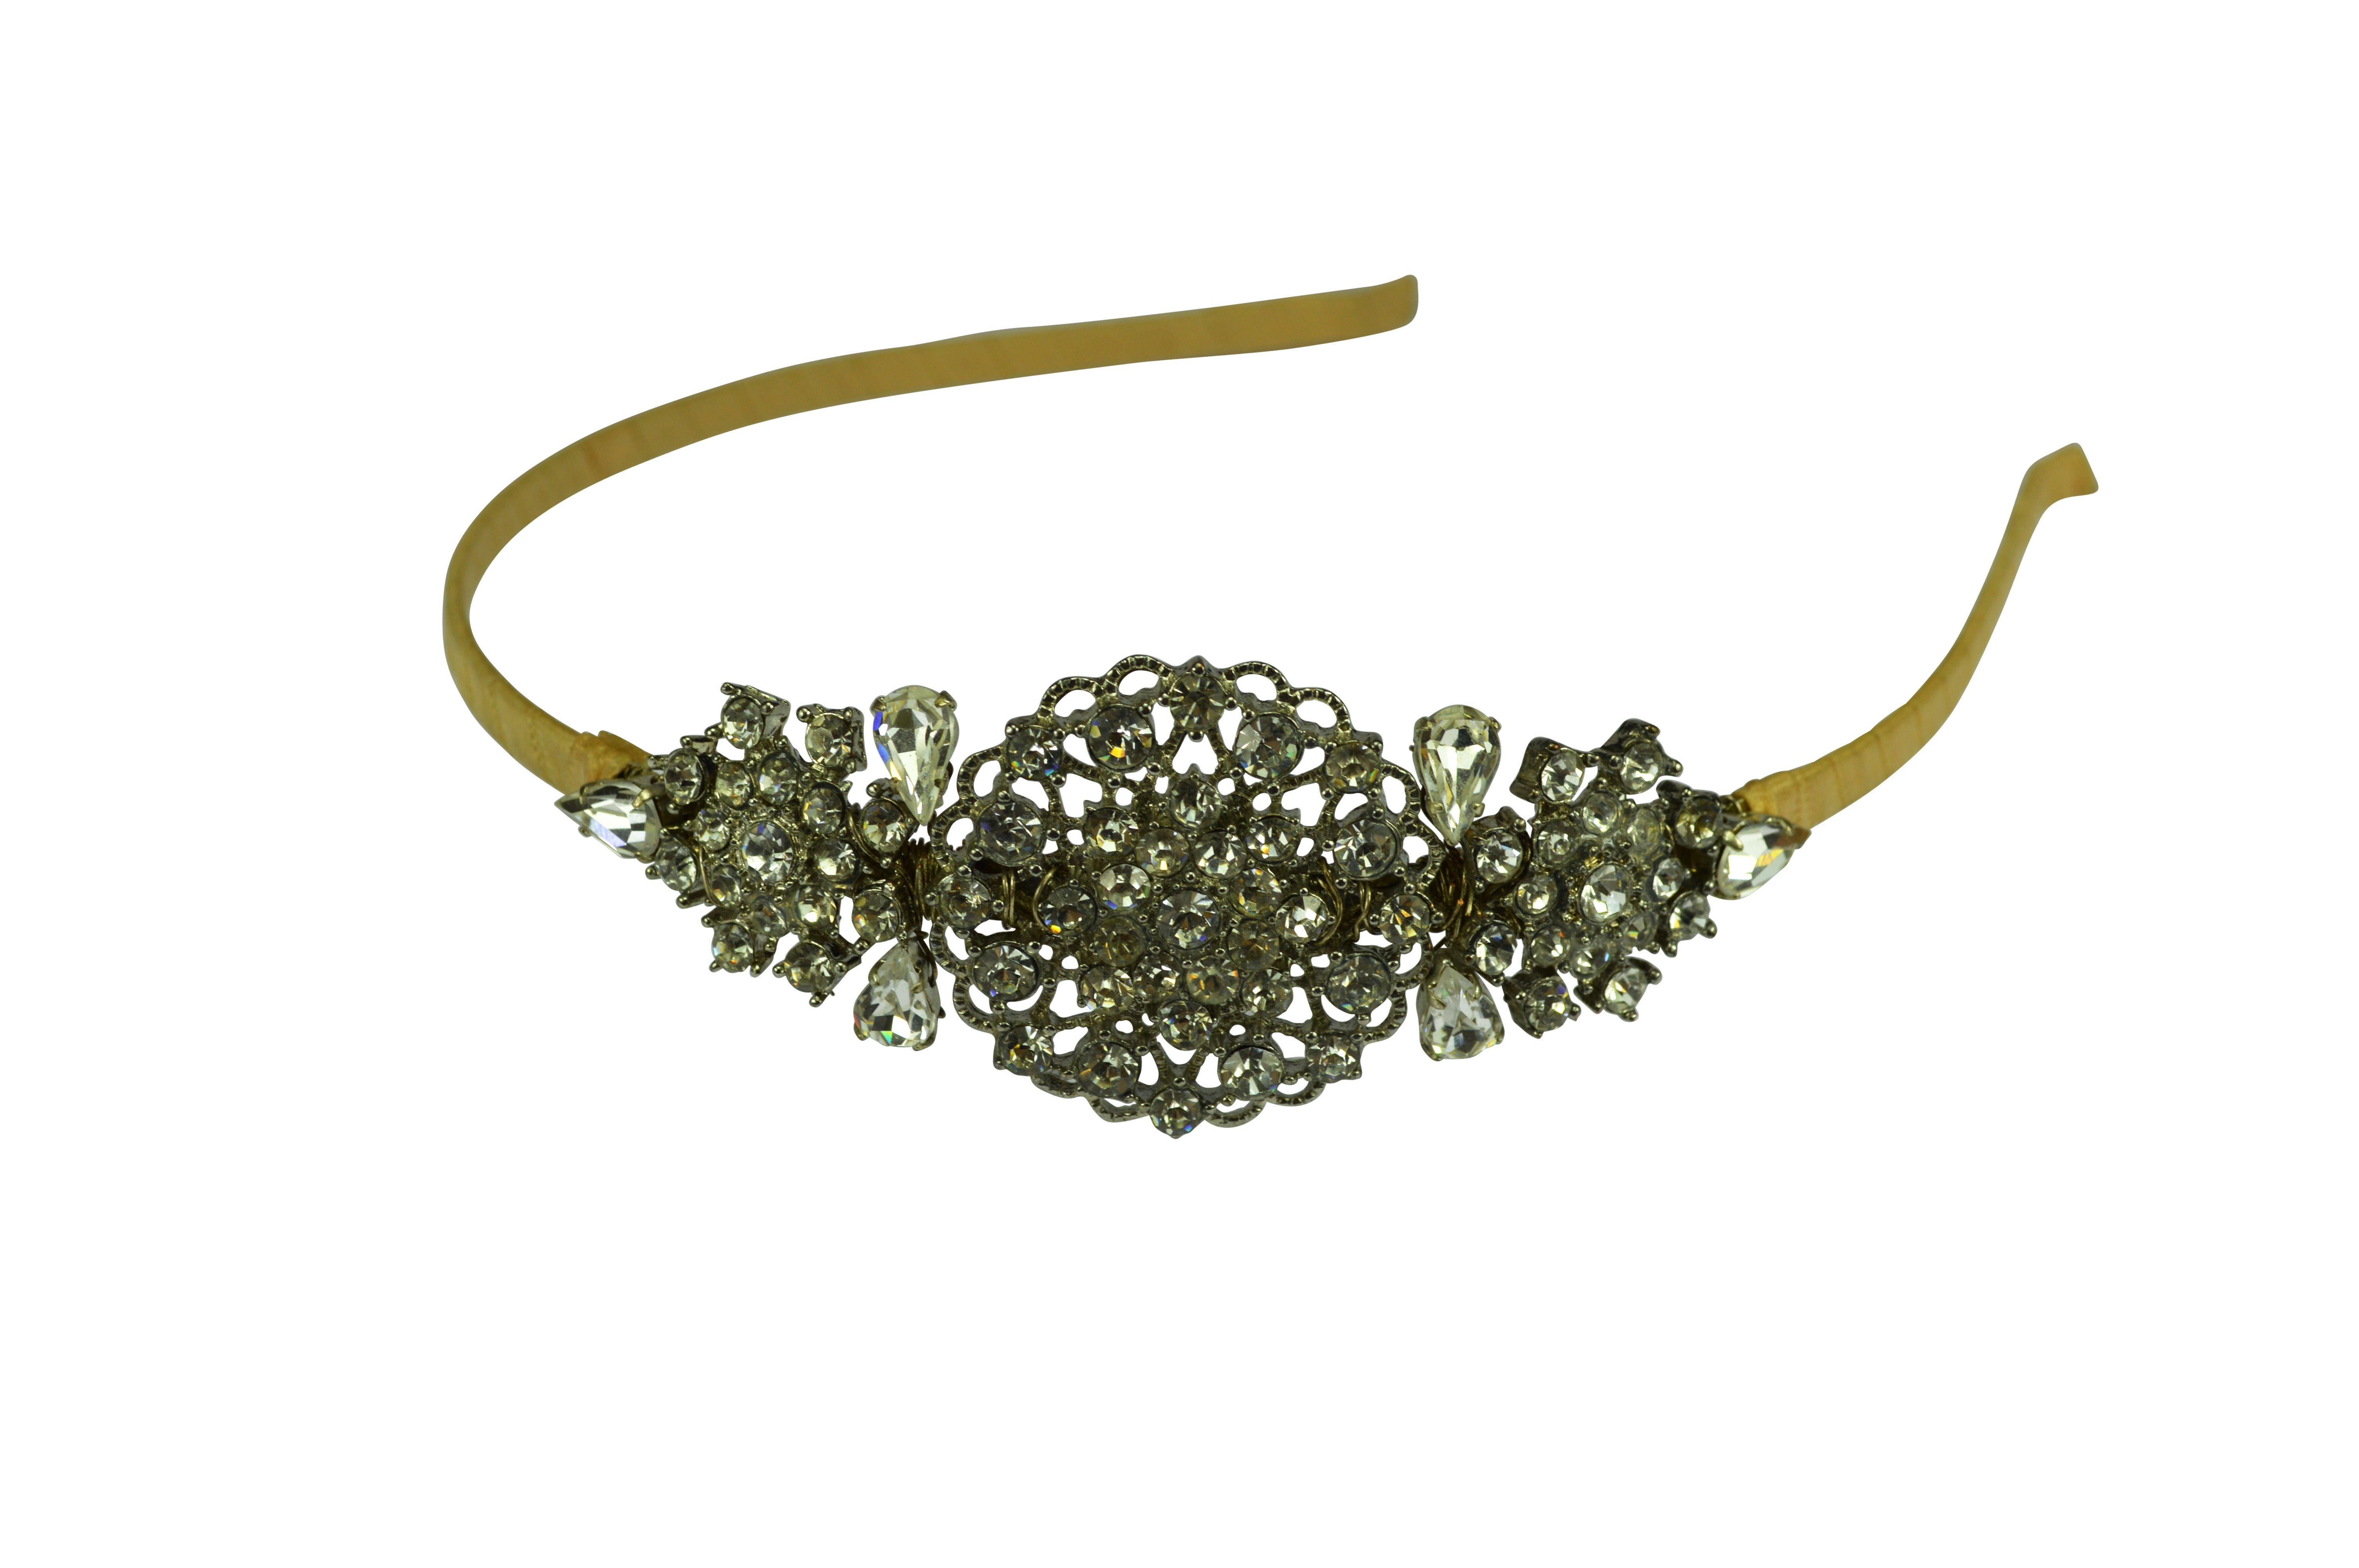 #crystalcreationstiaras #wedding #bride #tiara #headdress #hairvine #headband #comb #handmade #diamante #crystal #pearl #kent #uk #london